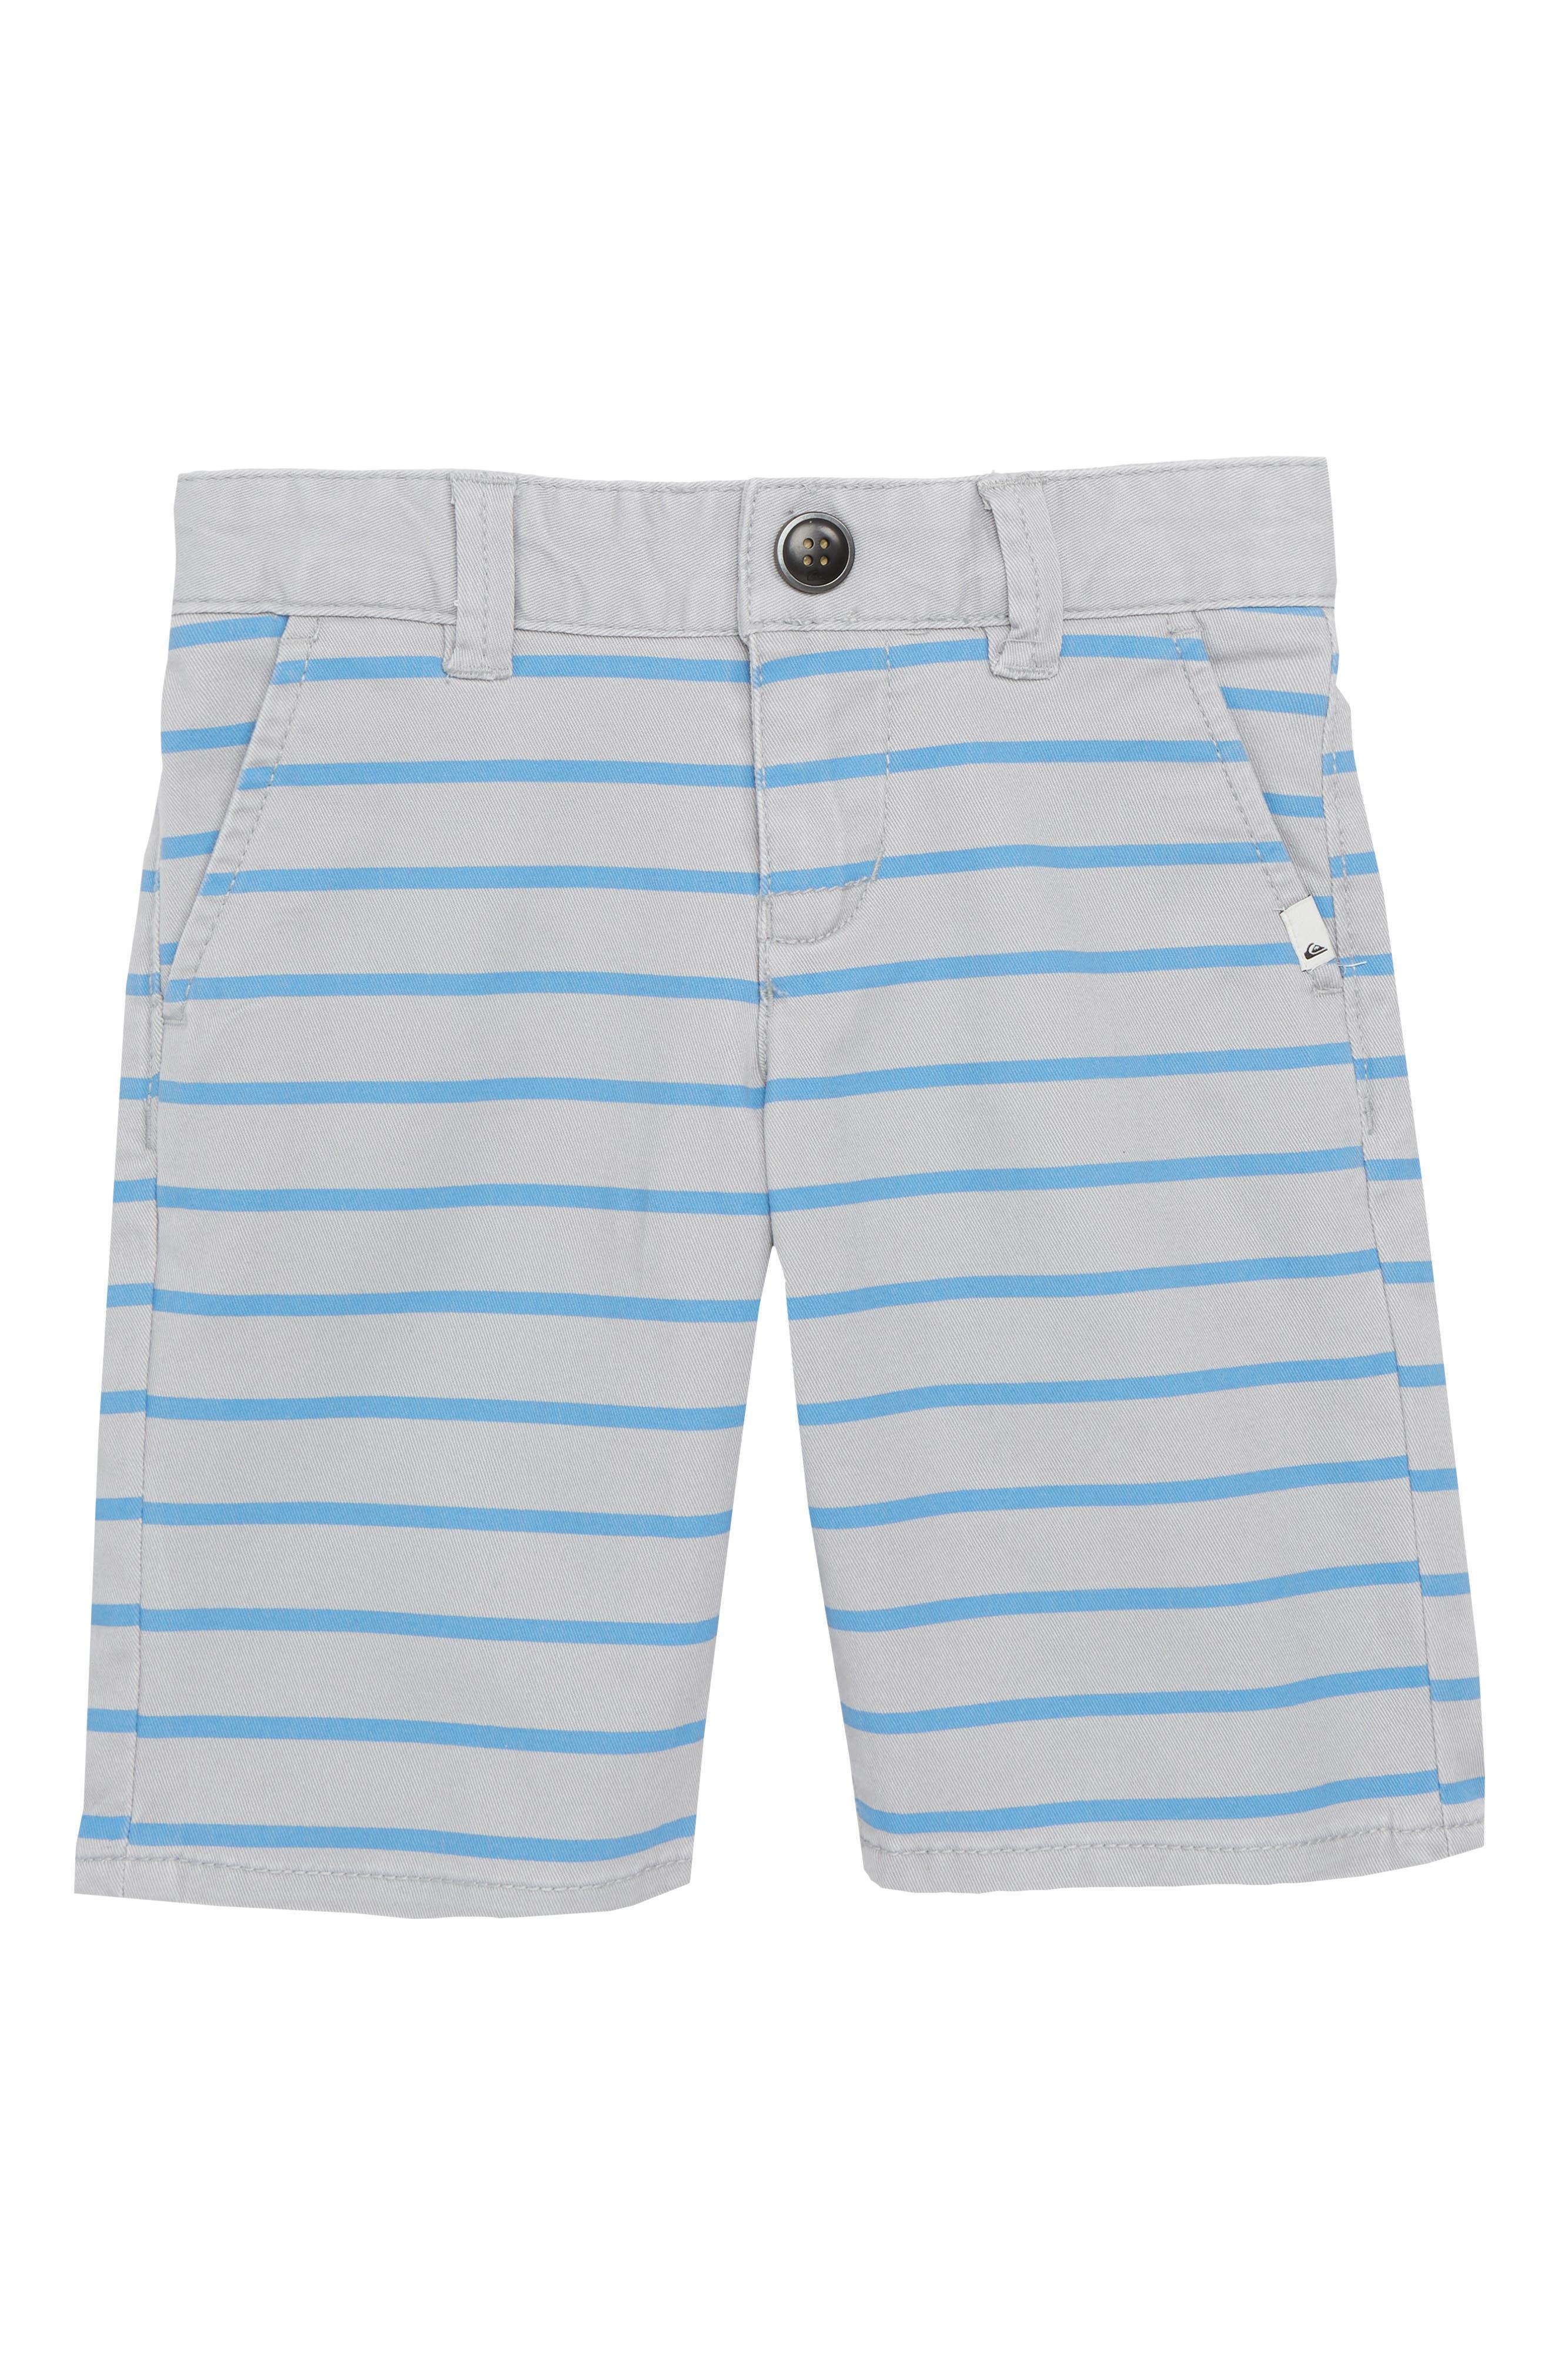 Waiku Stripe Shorts,                             Main thumbnail 1, color,                             031